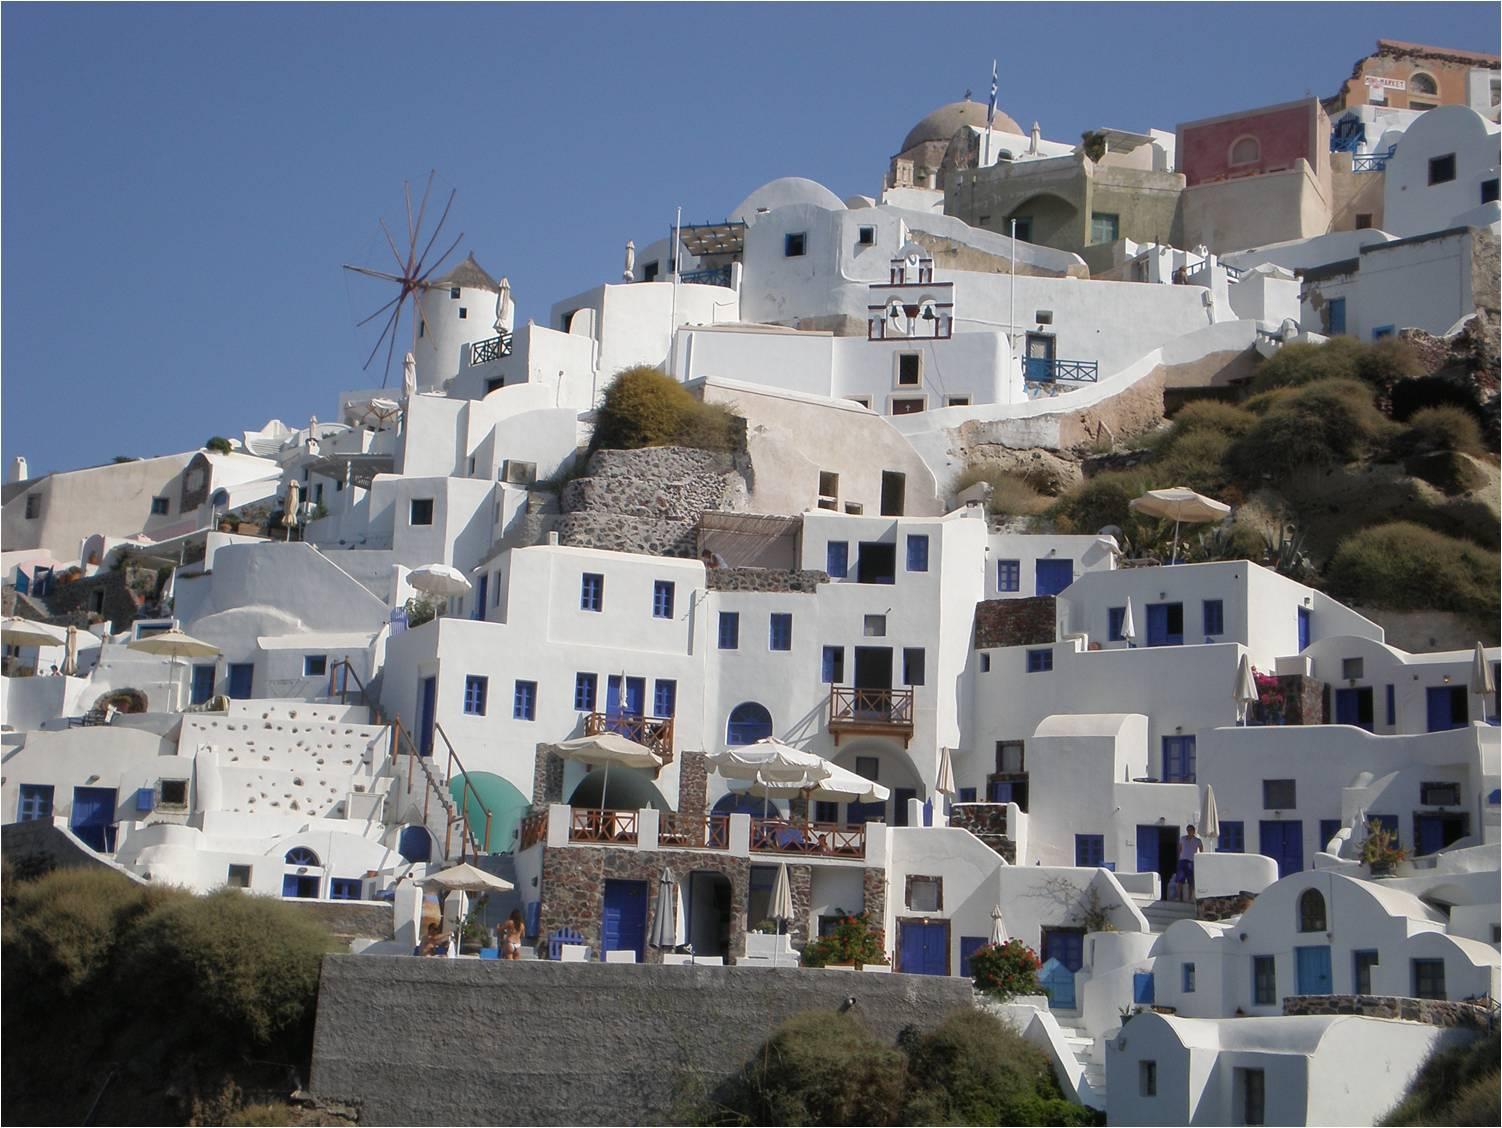 lorne sandy and kristin 39 s adventures in greece. Black Bedroom Furniture Sets. Home Design Ideas